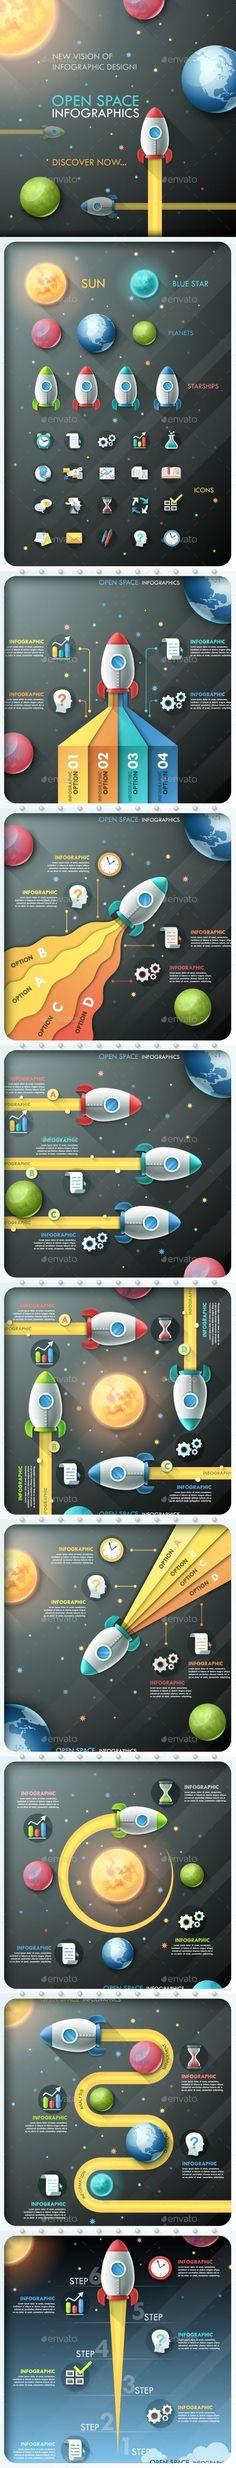 Business infographic : Business infographic : Business infographic : Open Space Infographics  Photoshop